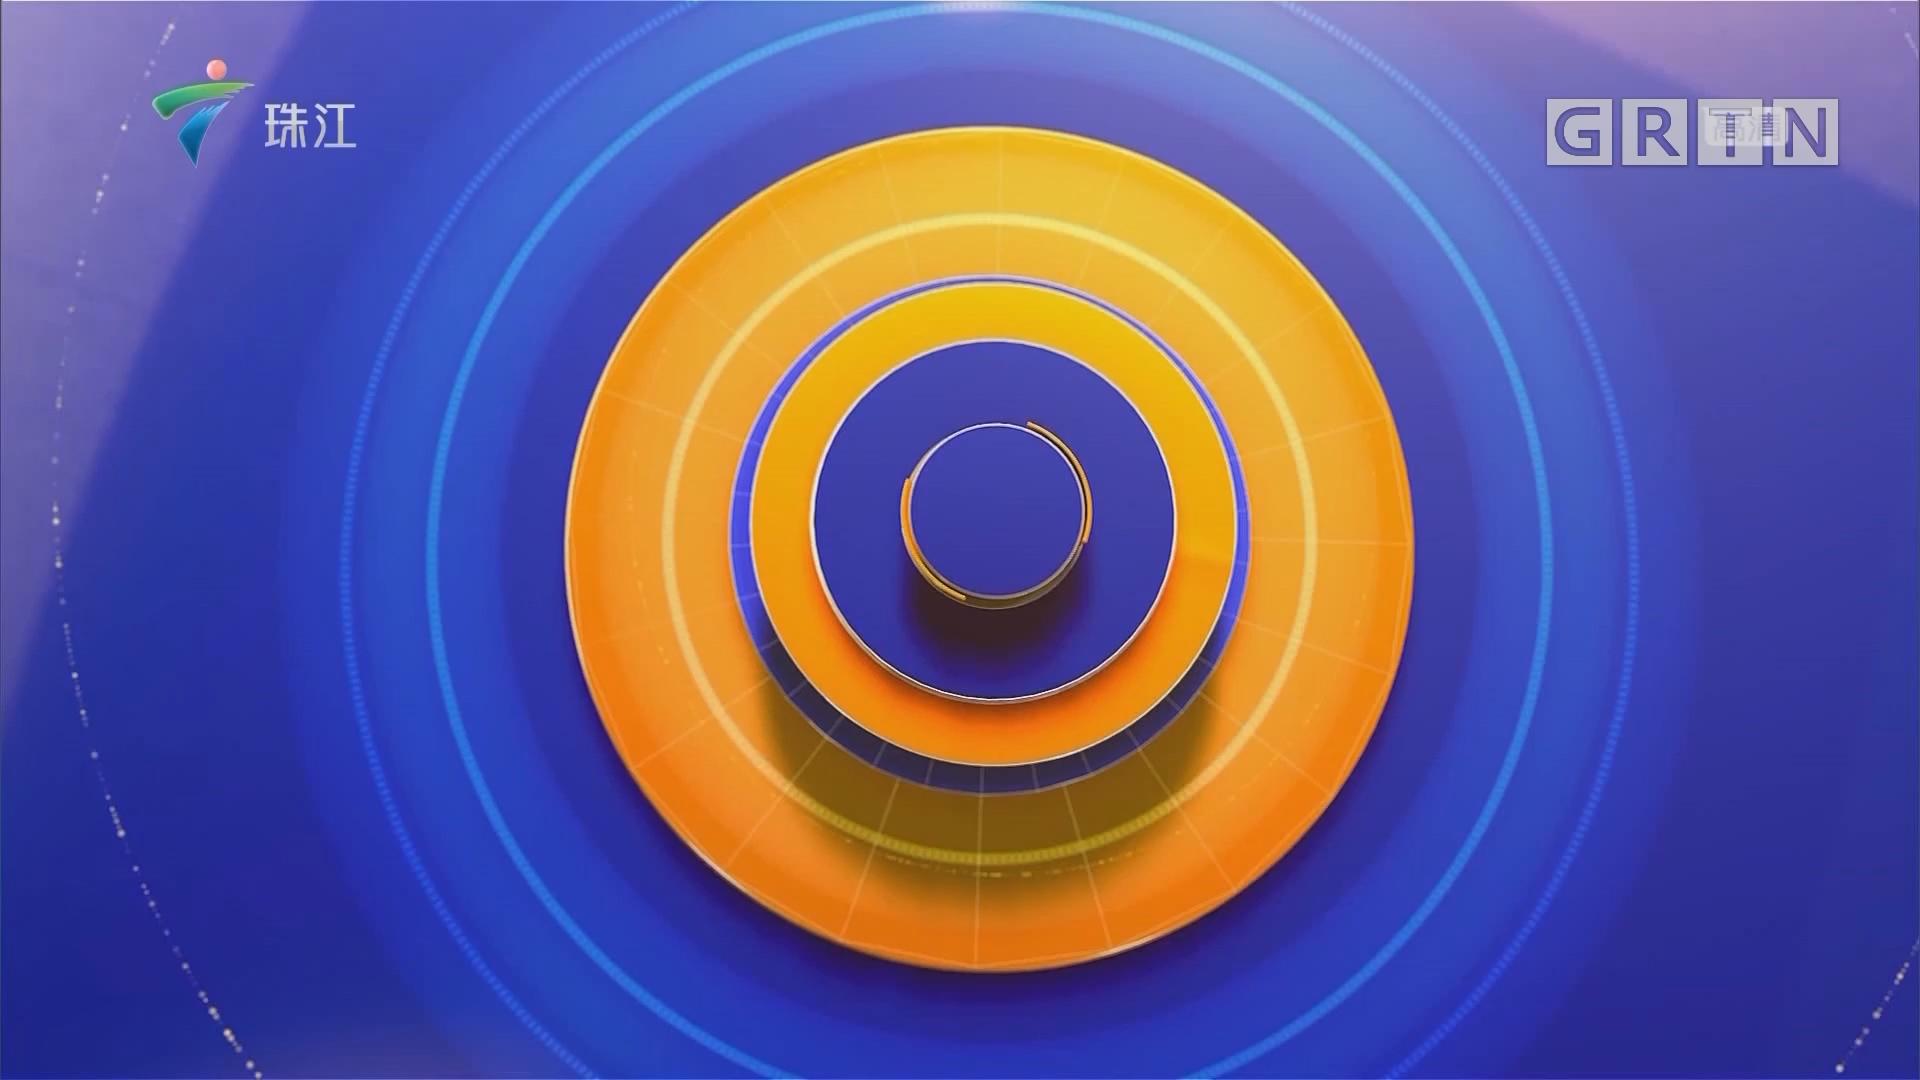 [HD][2019-09-19]今日财经:一带一路国际合作发展(深圳)研究院与广东卫视频道签署了战略合作框架协议